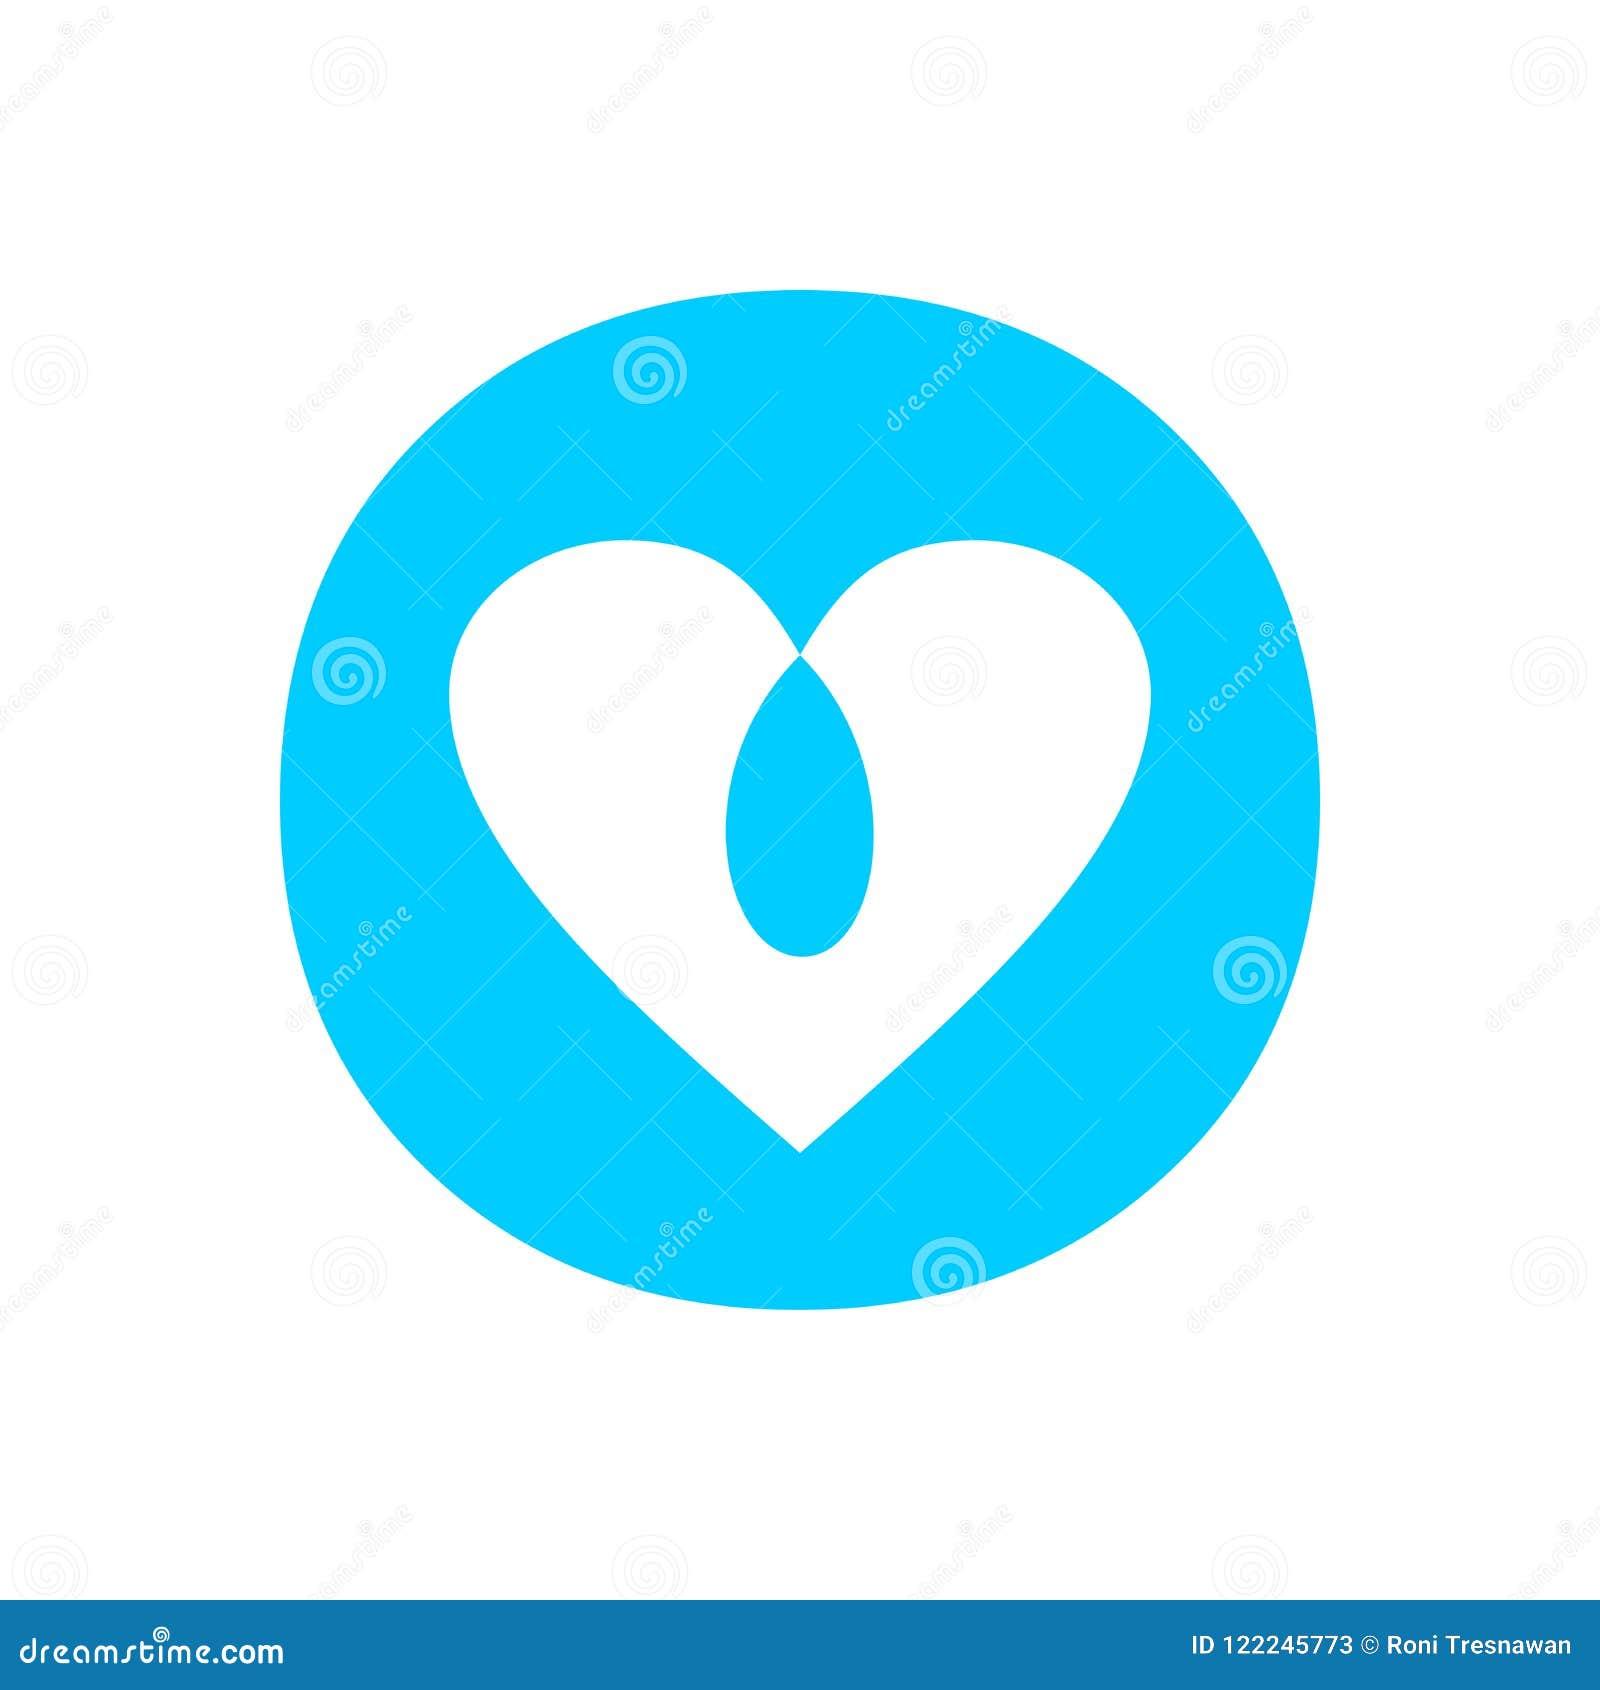 Blue Love Intersection Circle Symbol Design Stock Vector